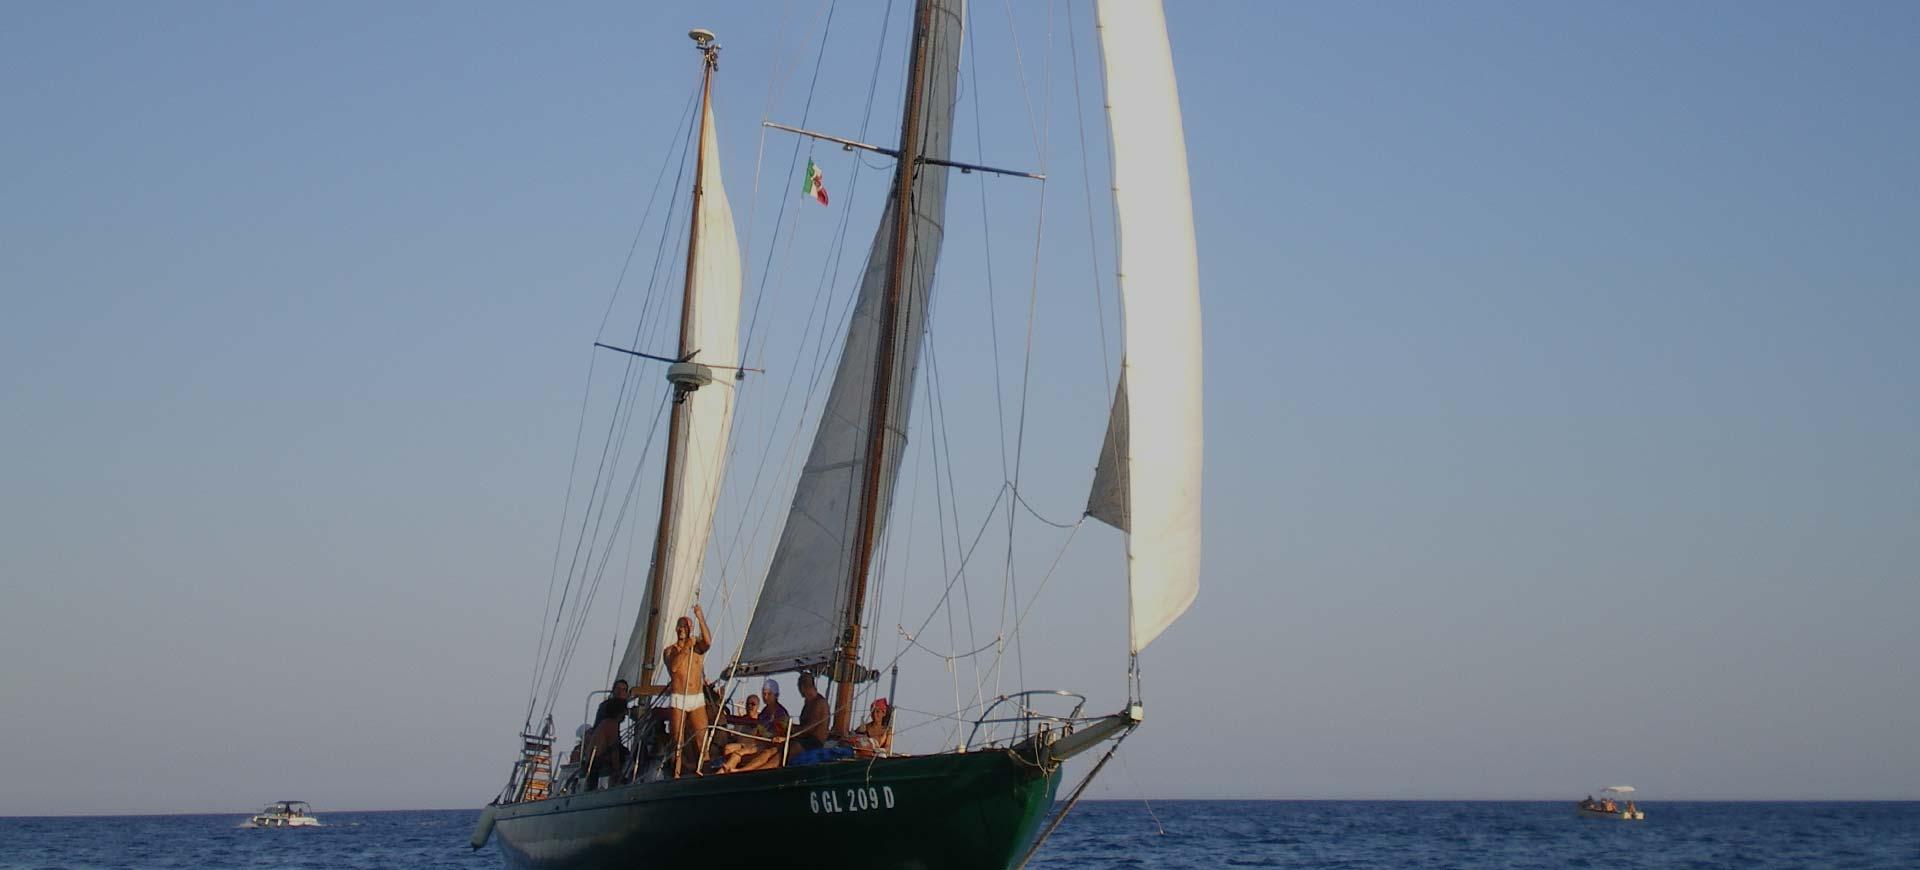 Sailing boat excursions in Salento